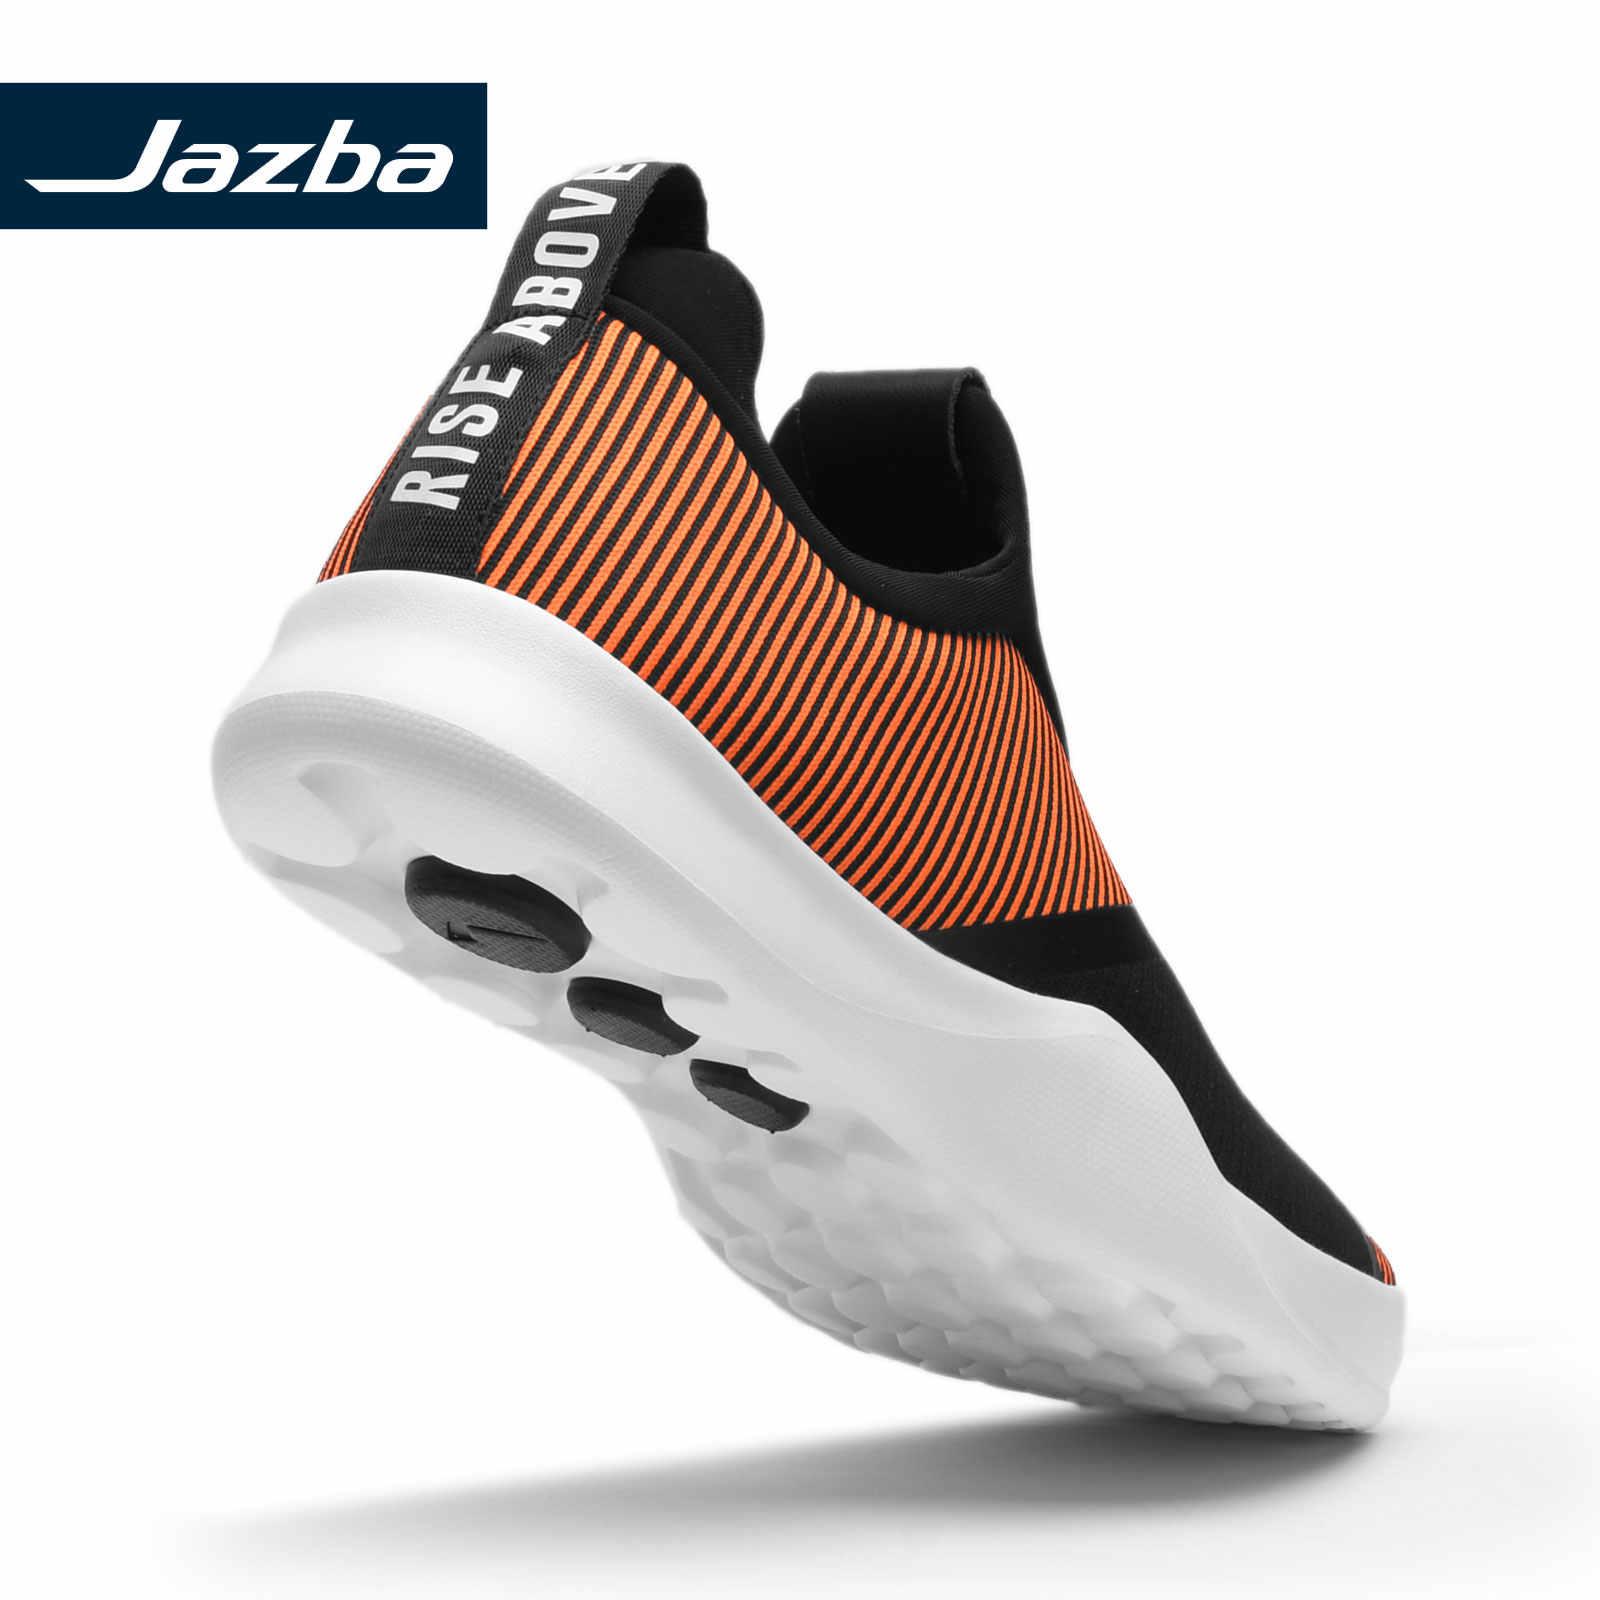 Jazba SAFAR Crossfit Slip On Shoe 2019